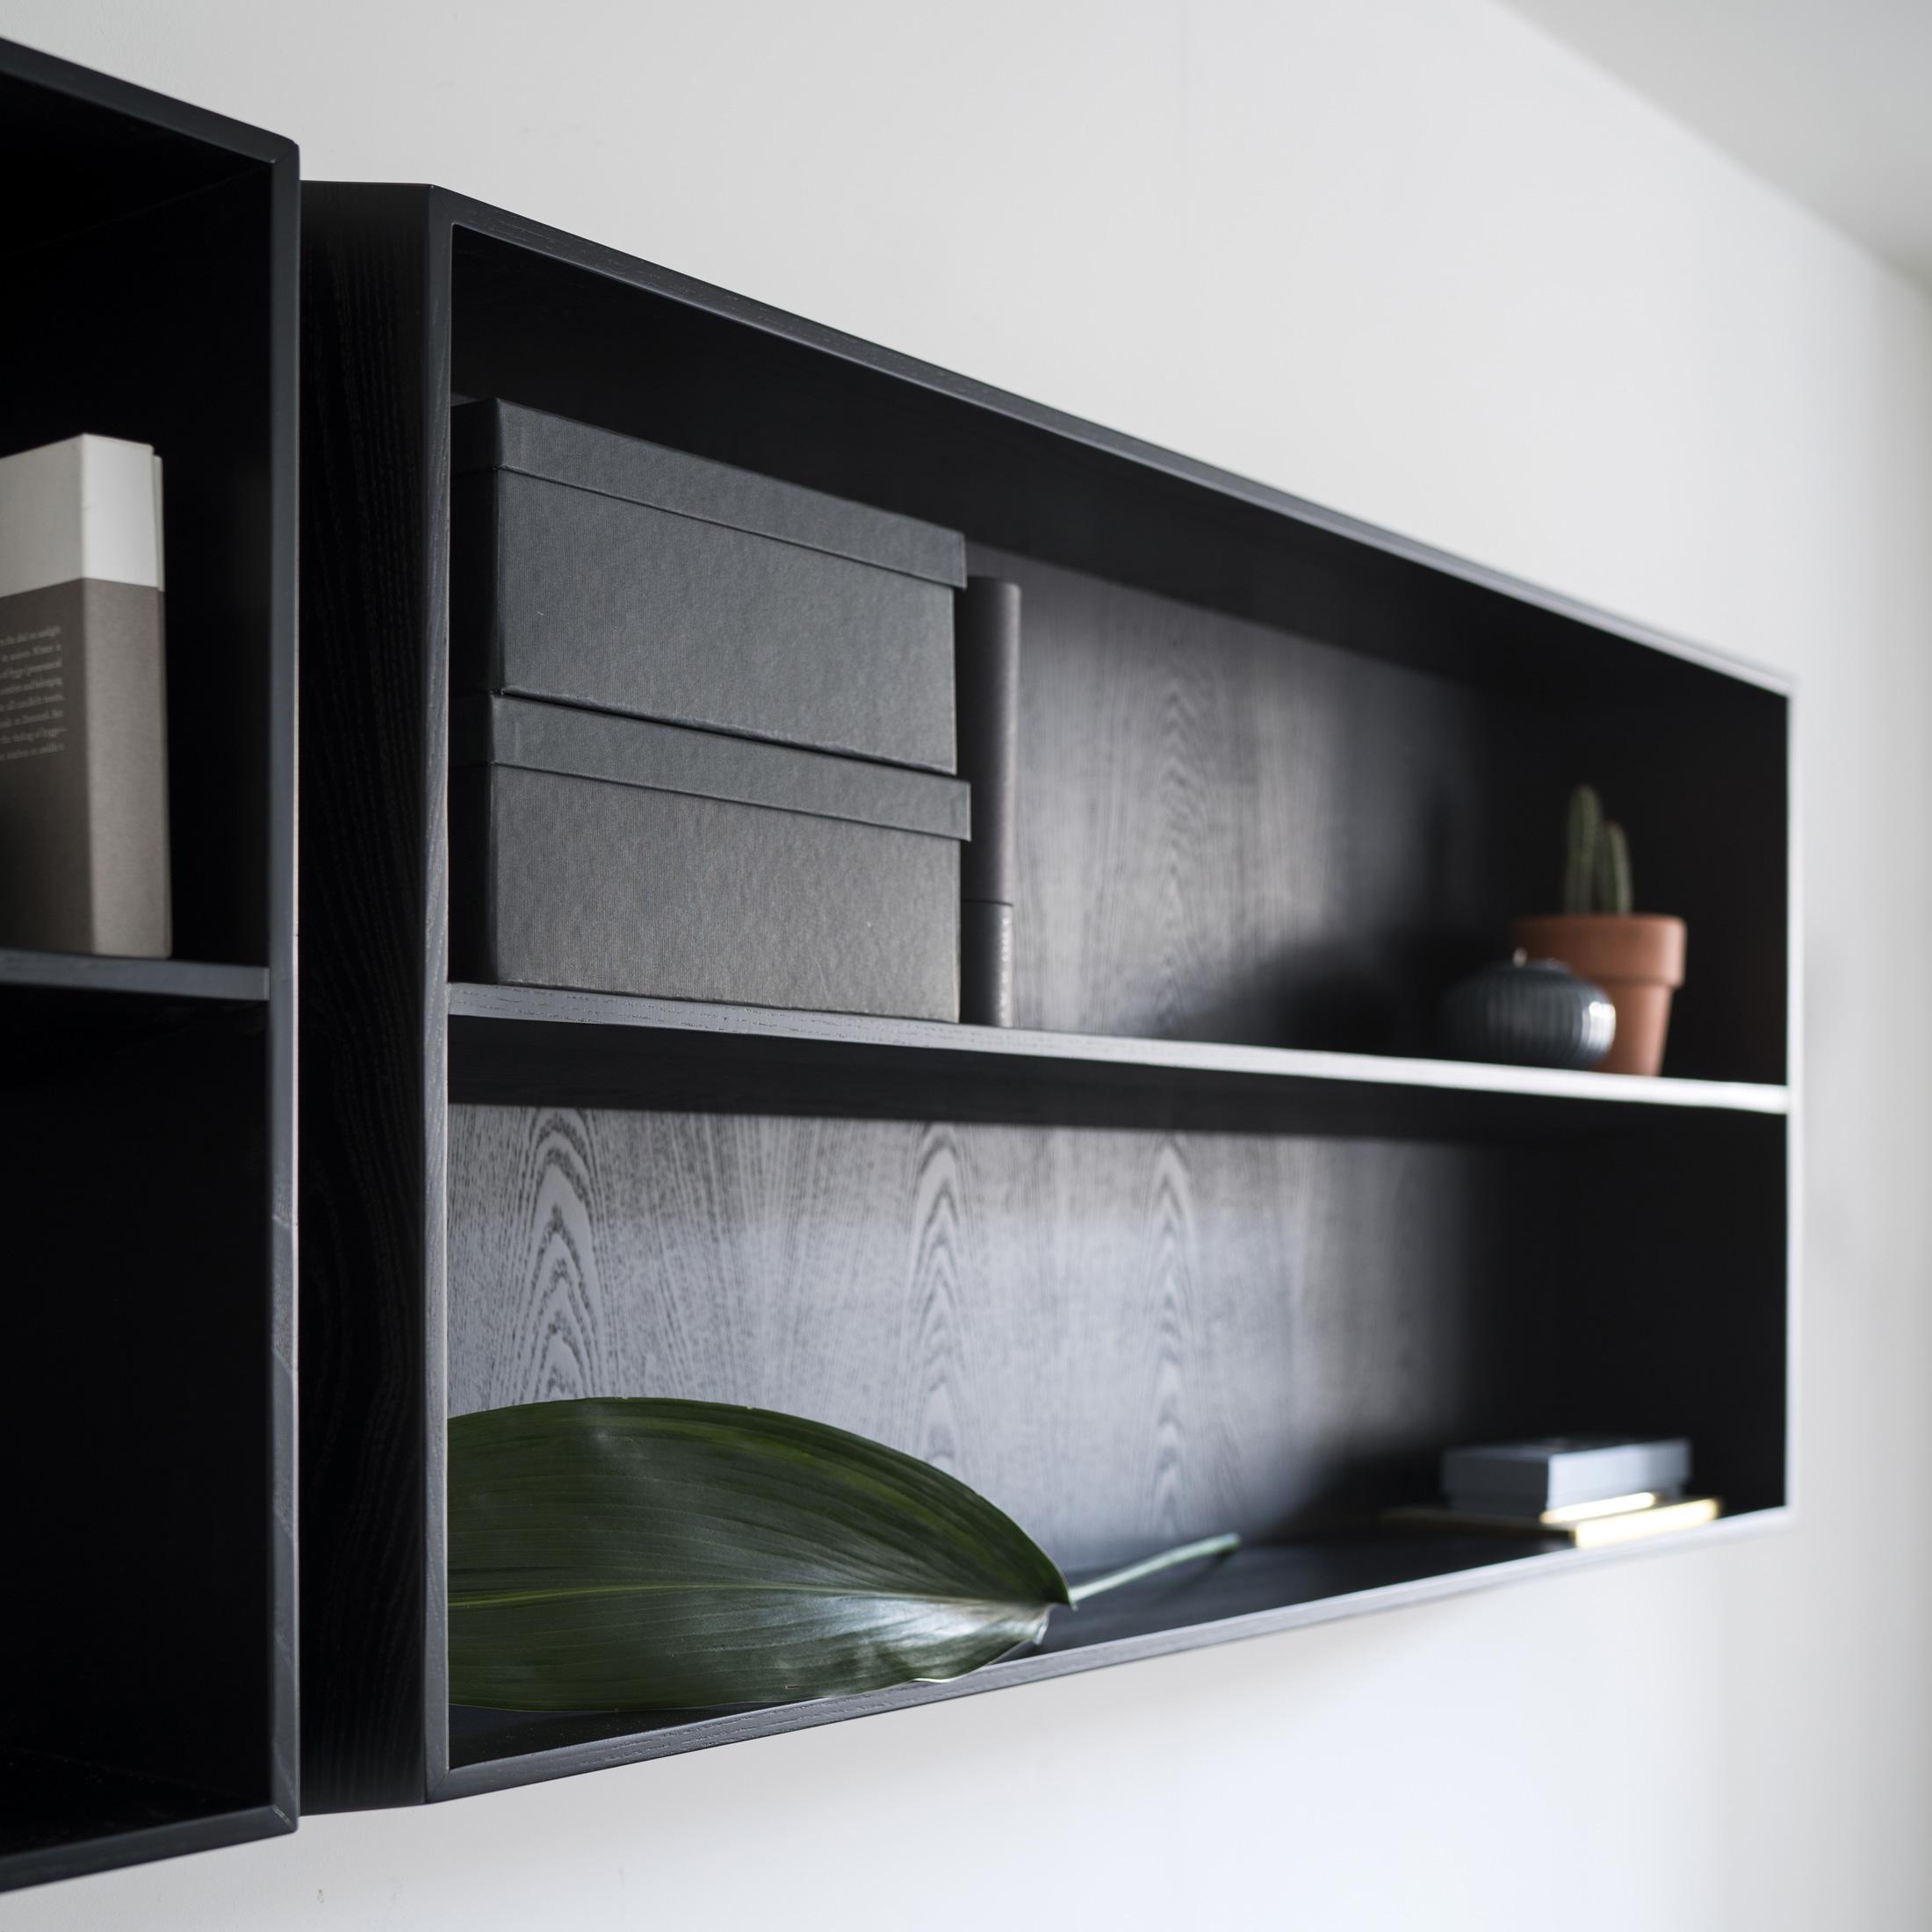 Brac, ex.t, flexible, furniture, system, shelves, deferrari modesti